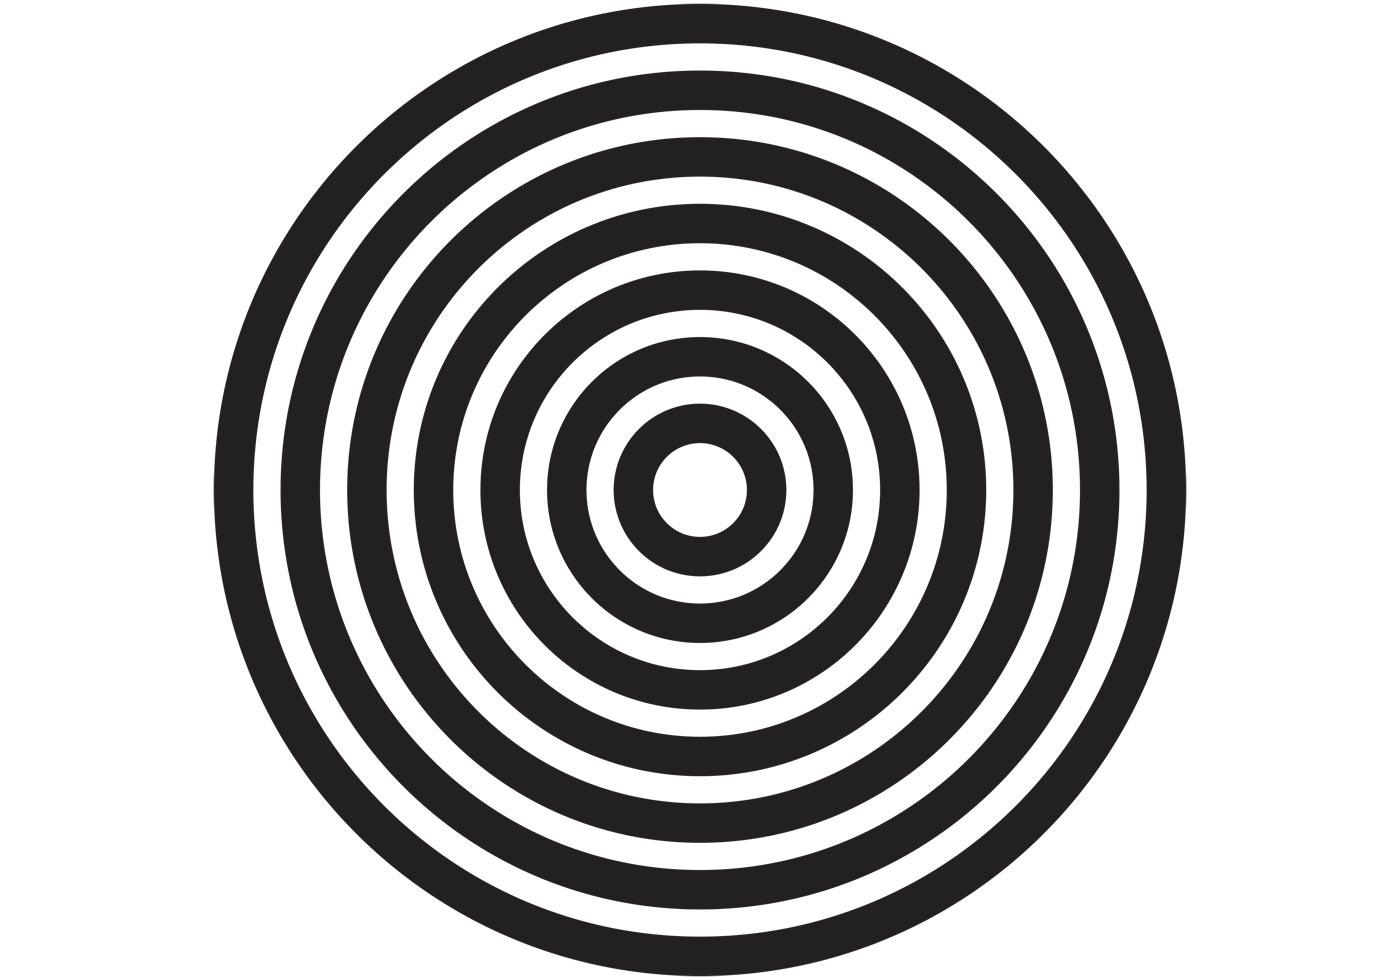 Círculos Concéntricos- Concentric Circles Vectors -Yahuali Nahuak